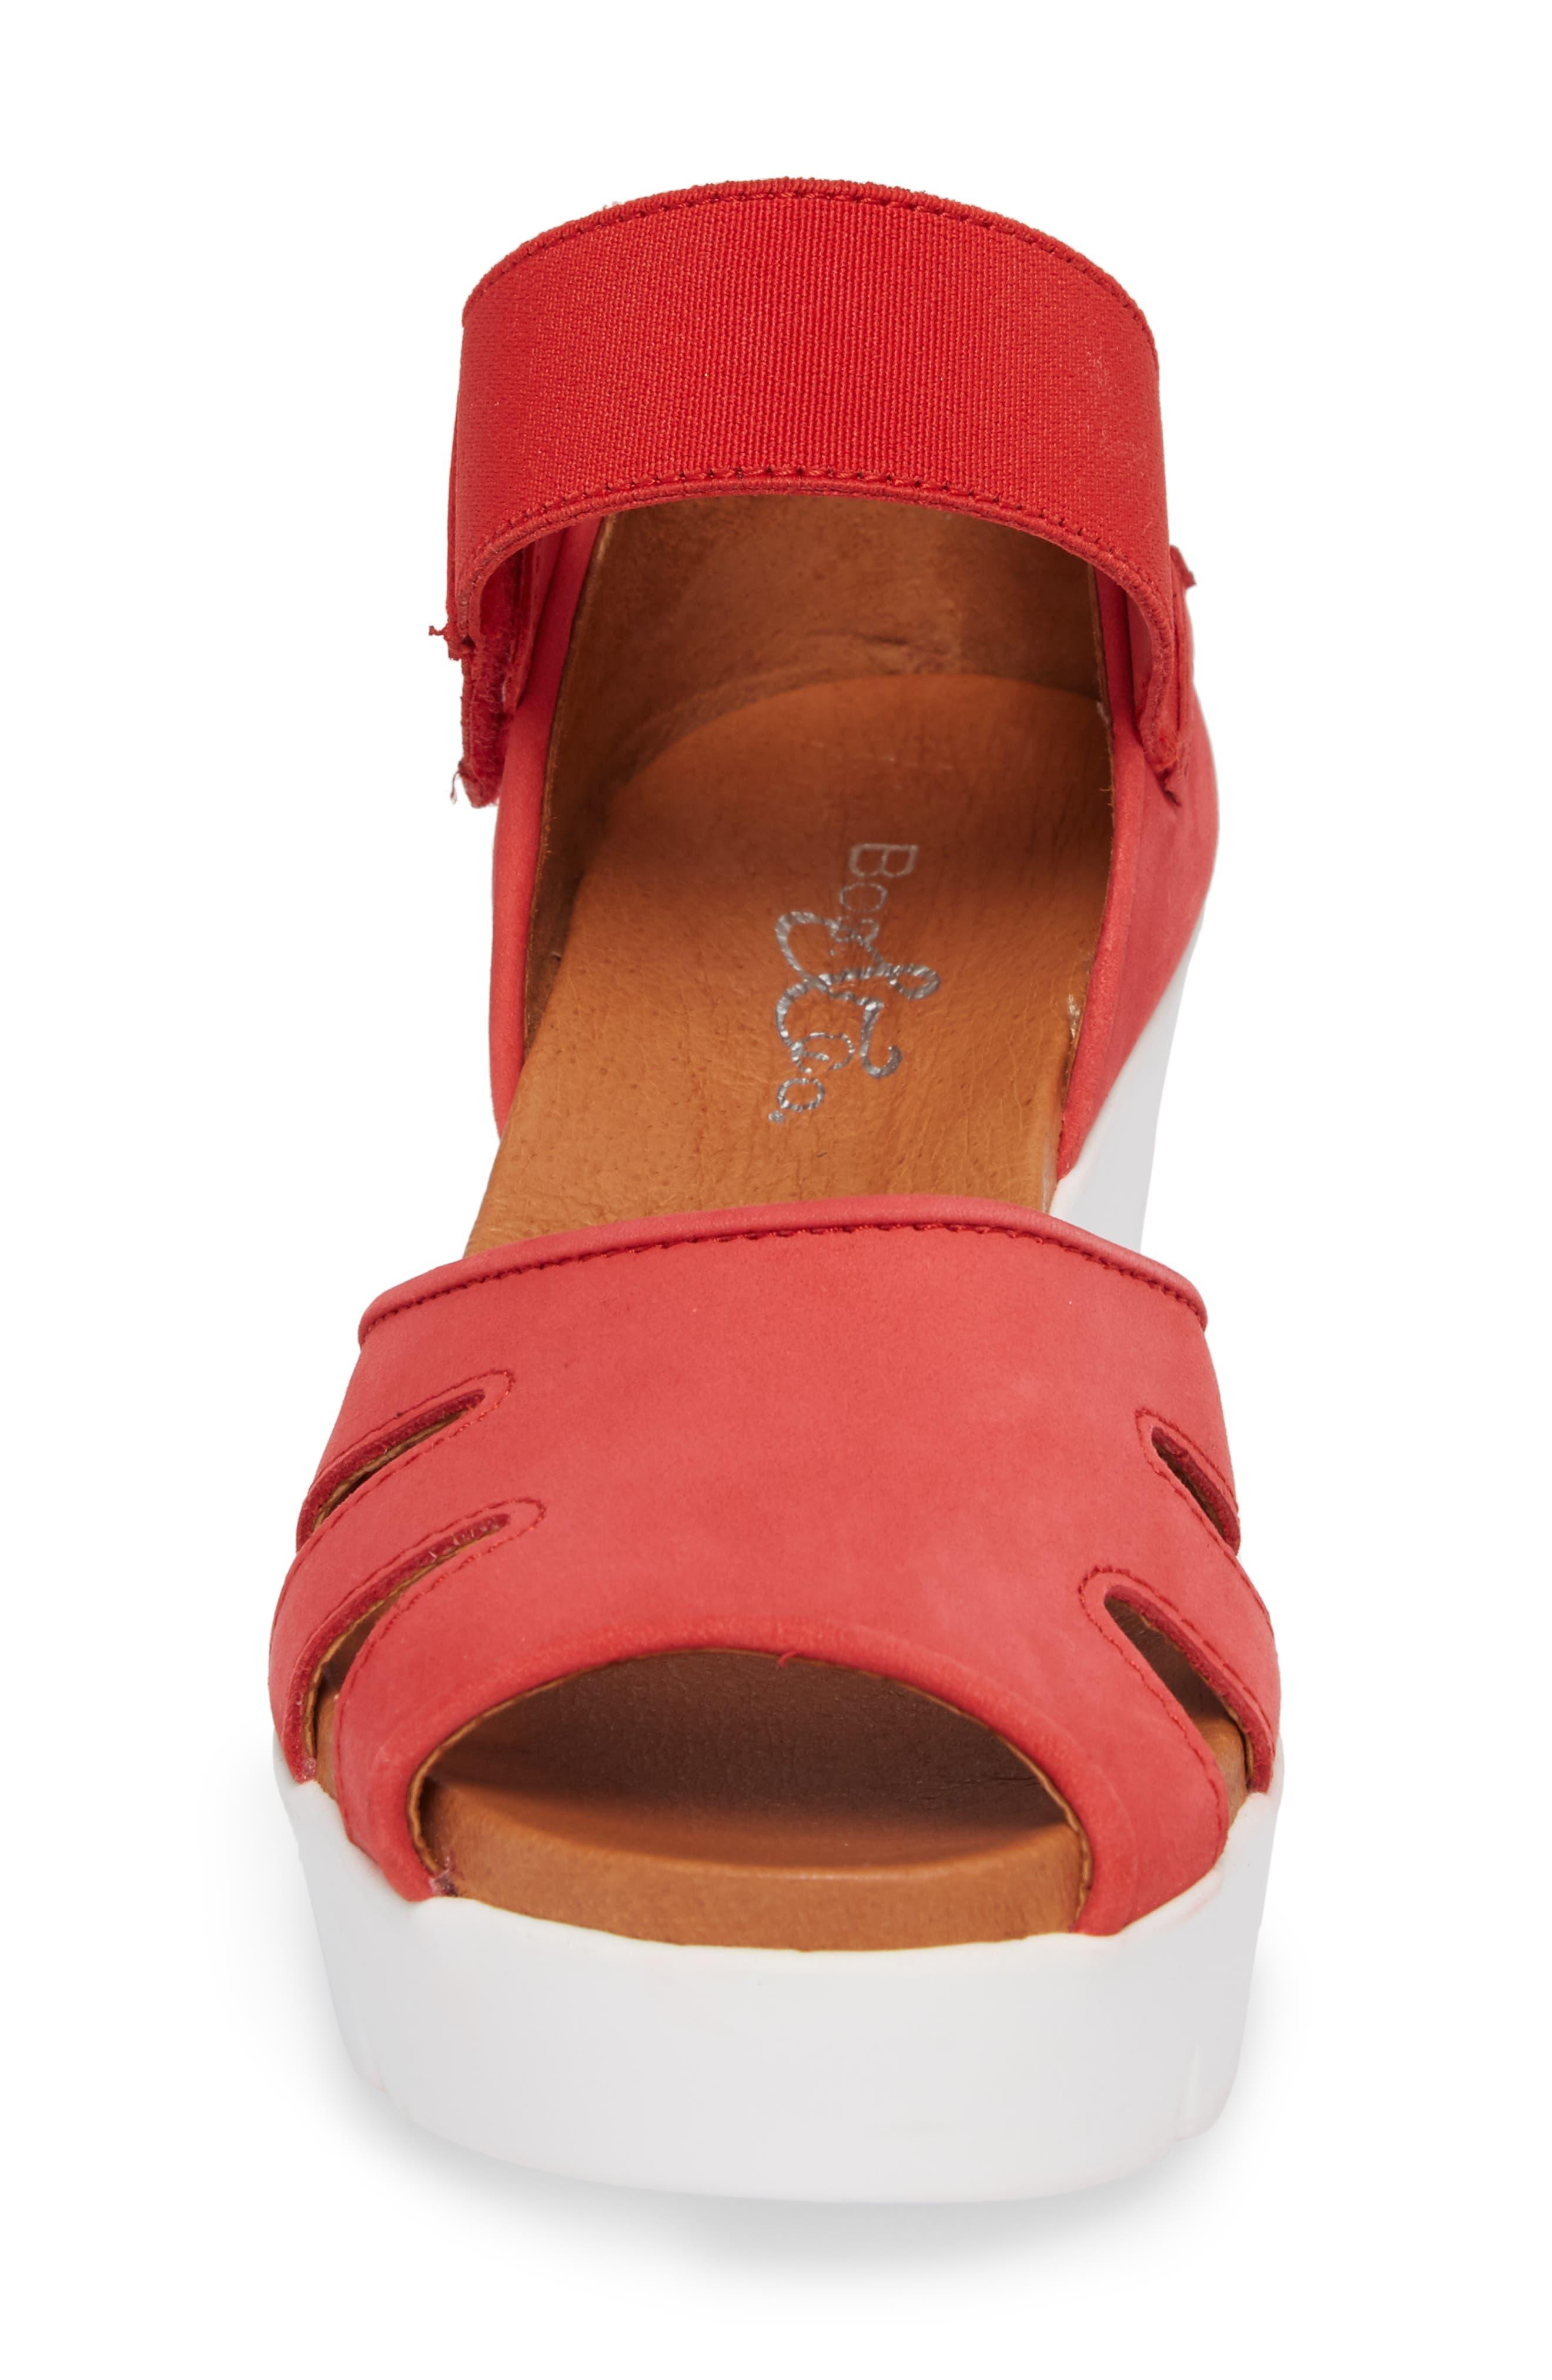 Sharon Platform Wedge Sandal,                             Alternate thumbnail 4, color,                             Red Nubuck Leather